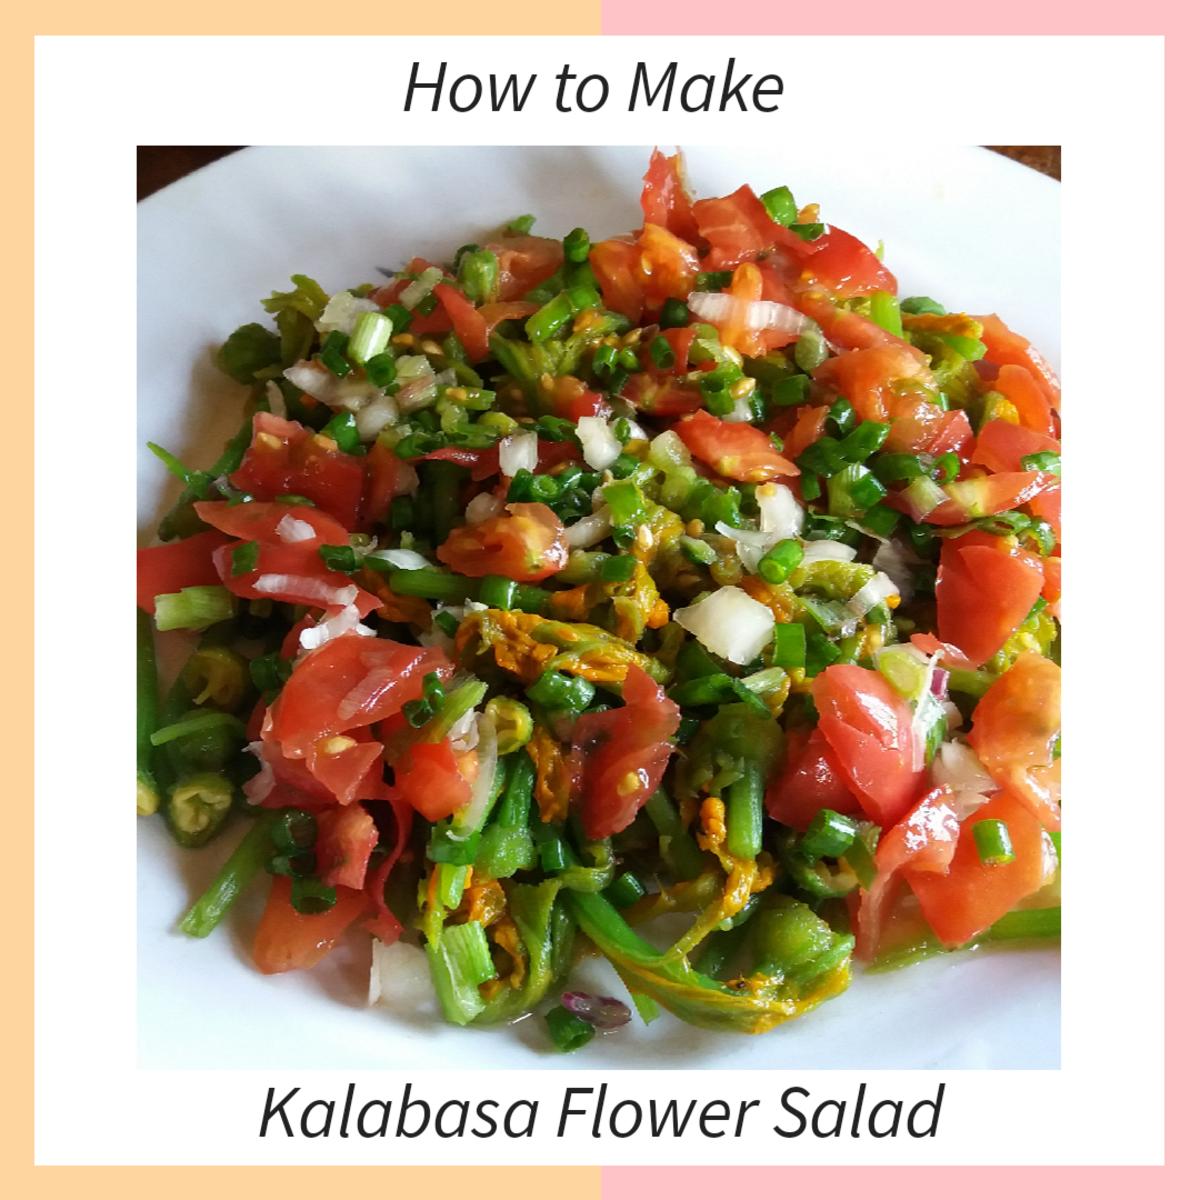 Learn how to make kalabasa flower salad